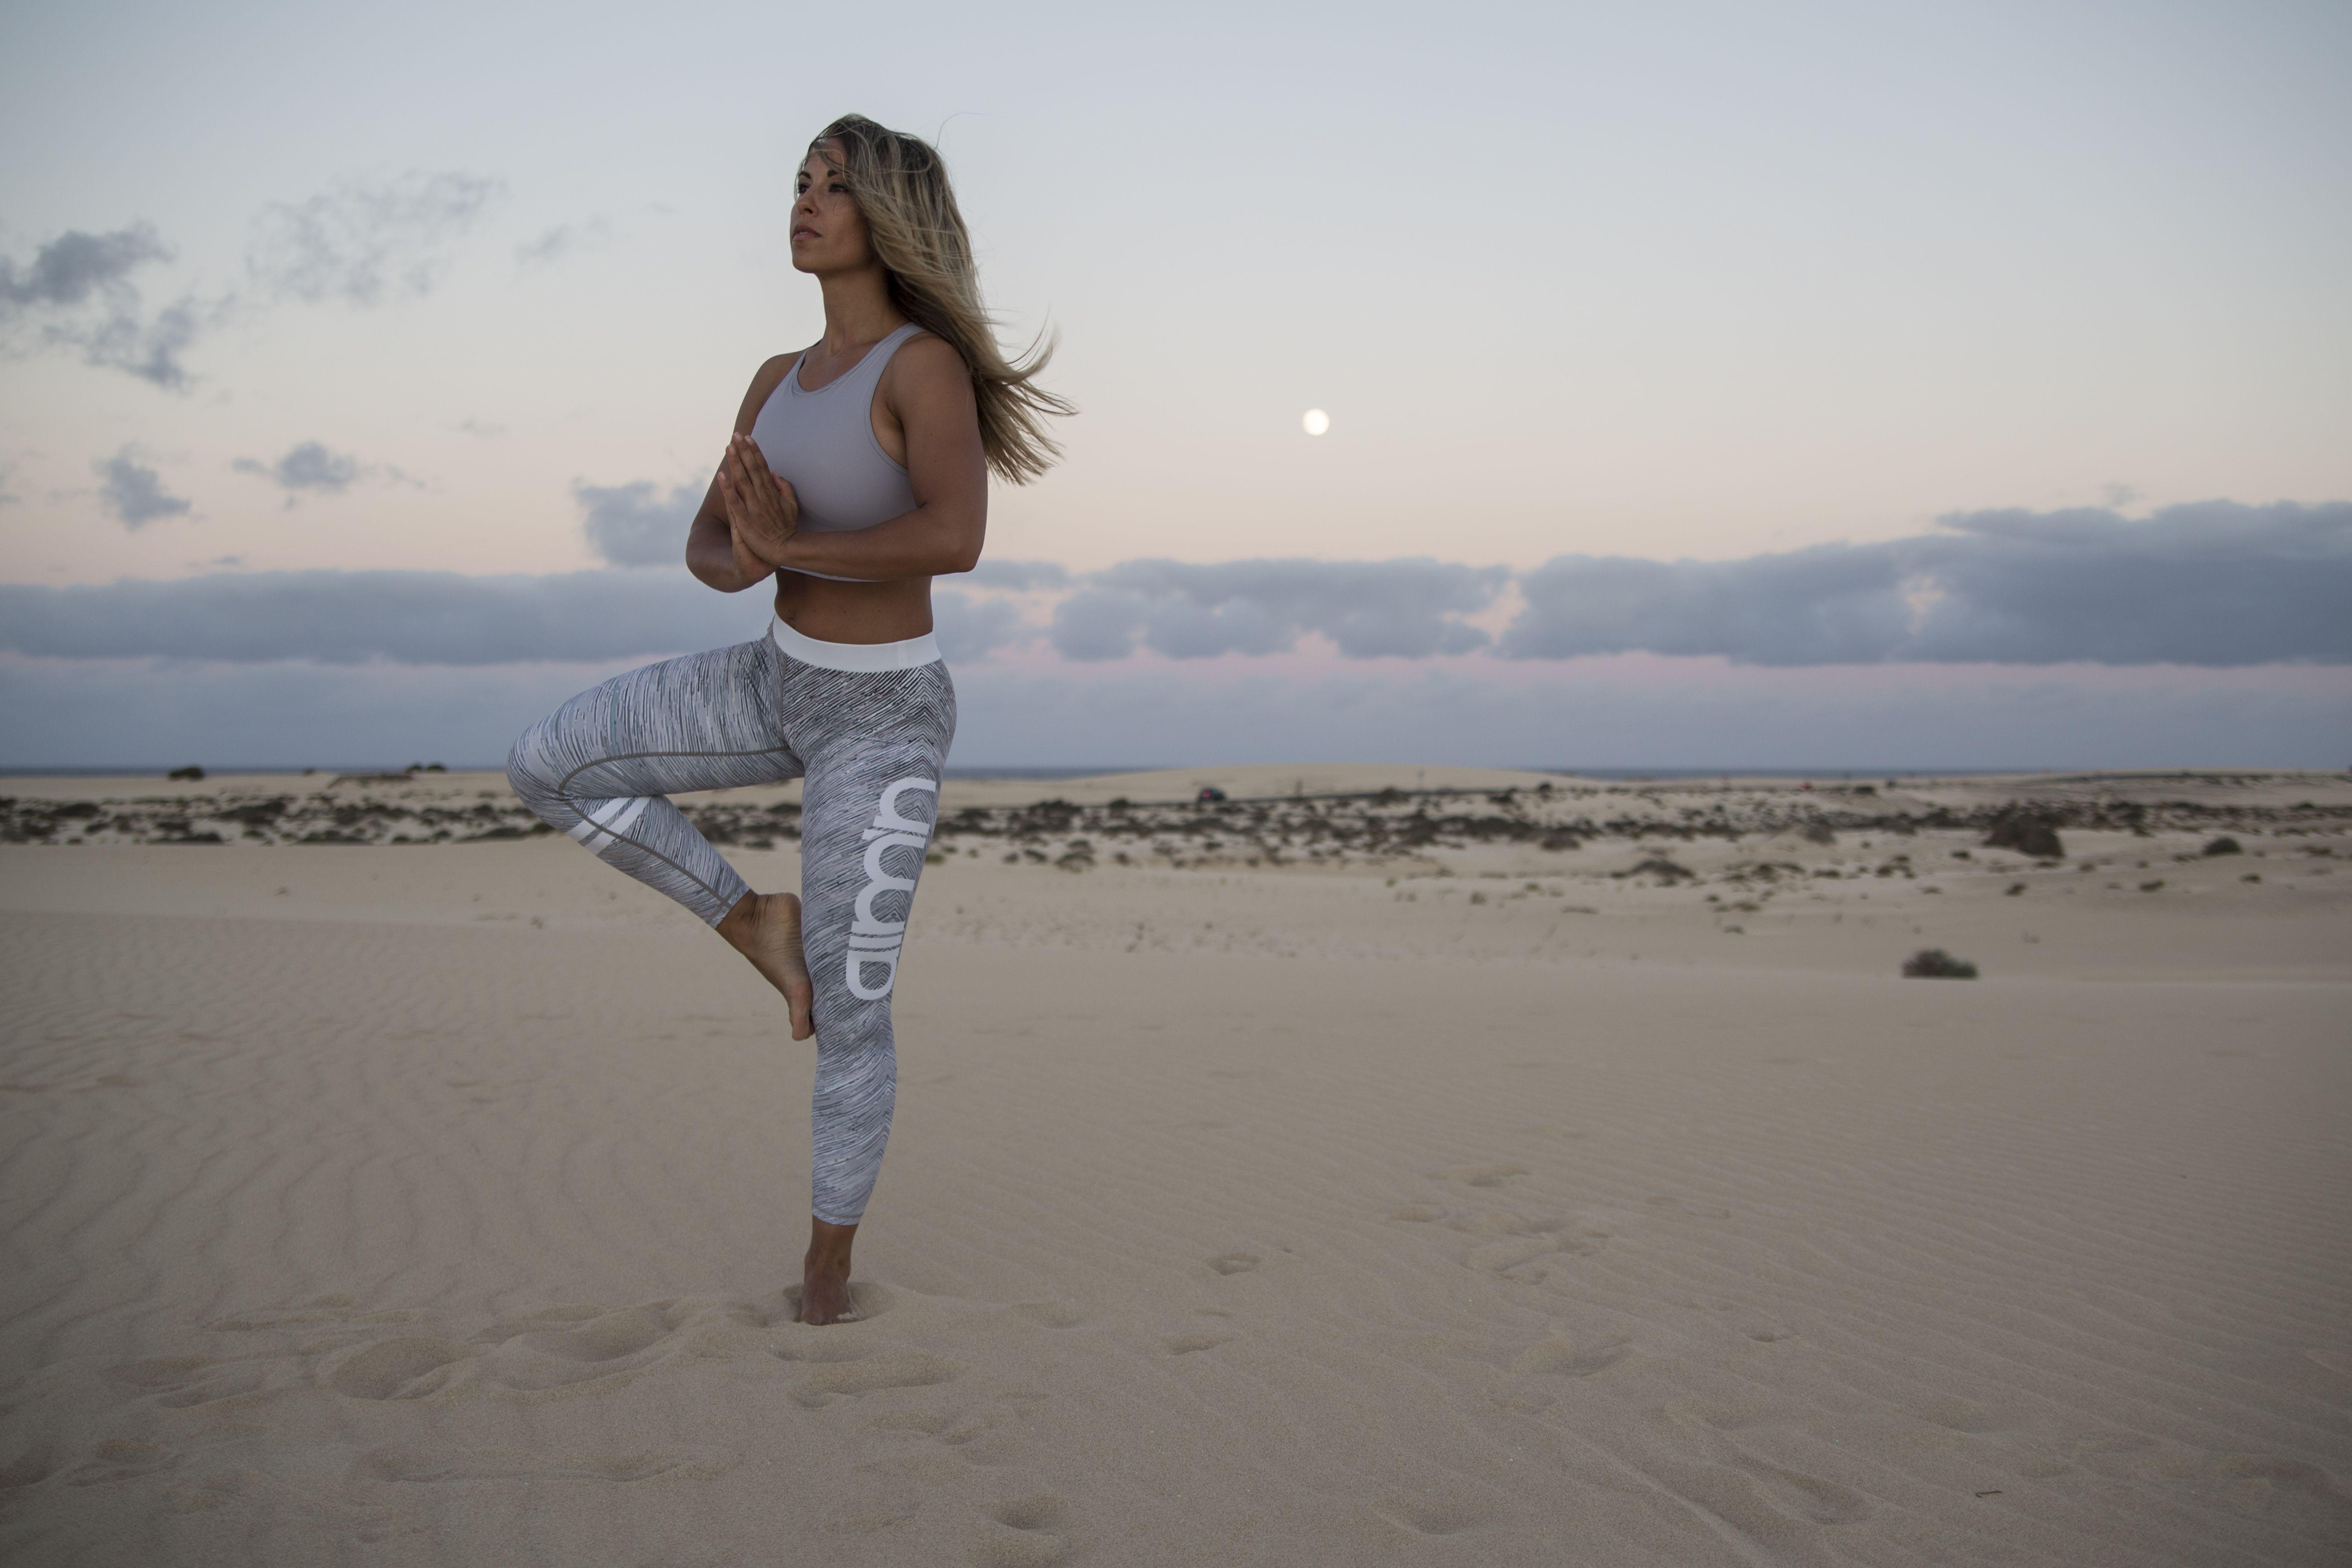 Aim N Hurricane Logo Tights 3 Yoga Yogapants Aim N Aimnsportswear Leggings Workout Gym Gym Outfit Comfortable Tights